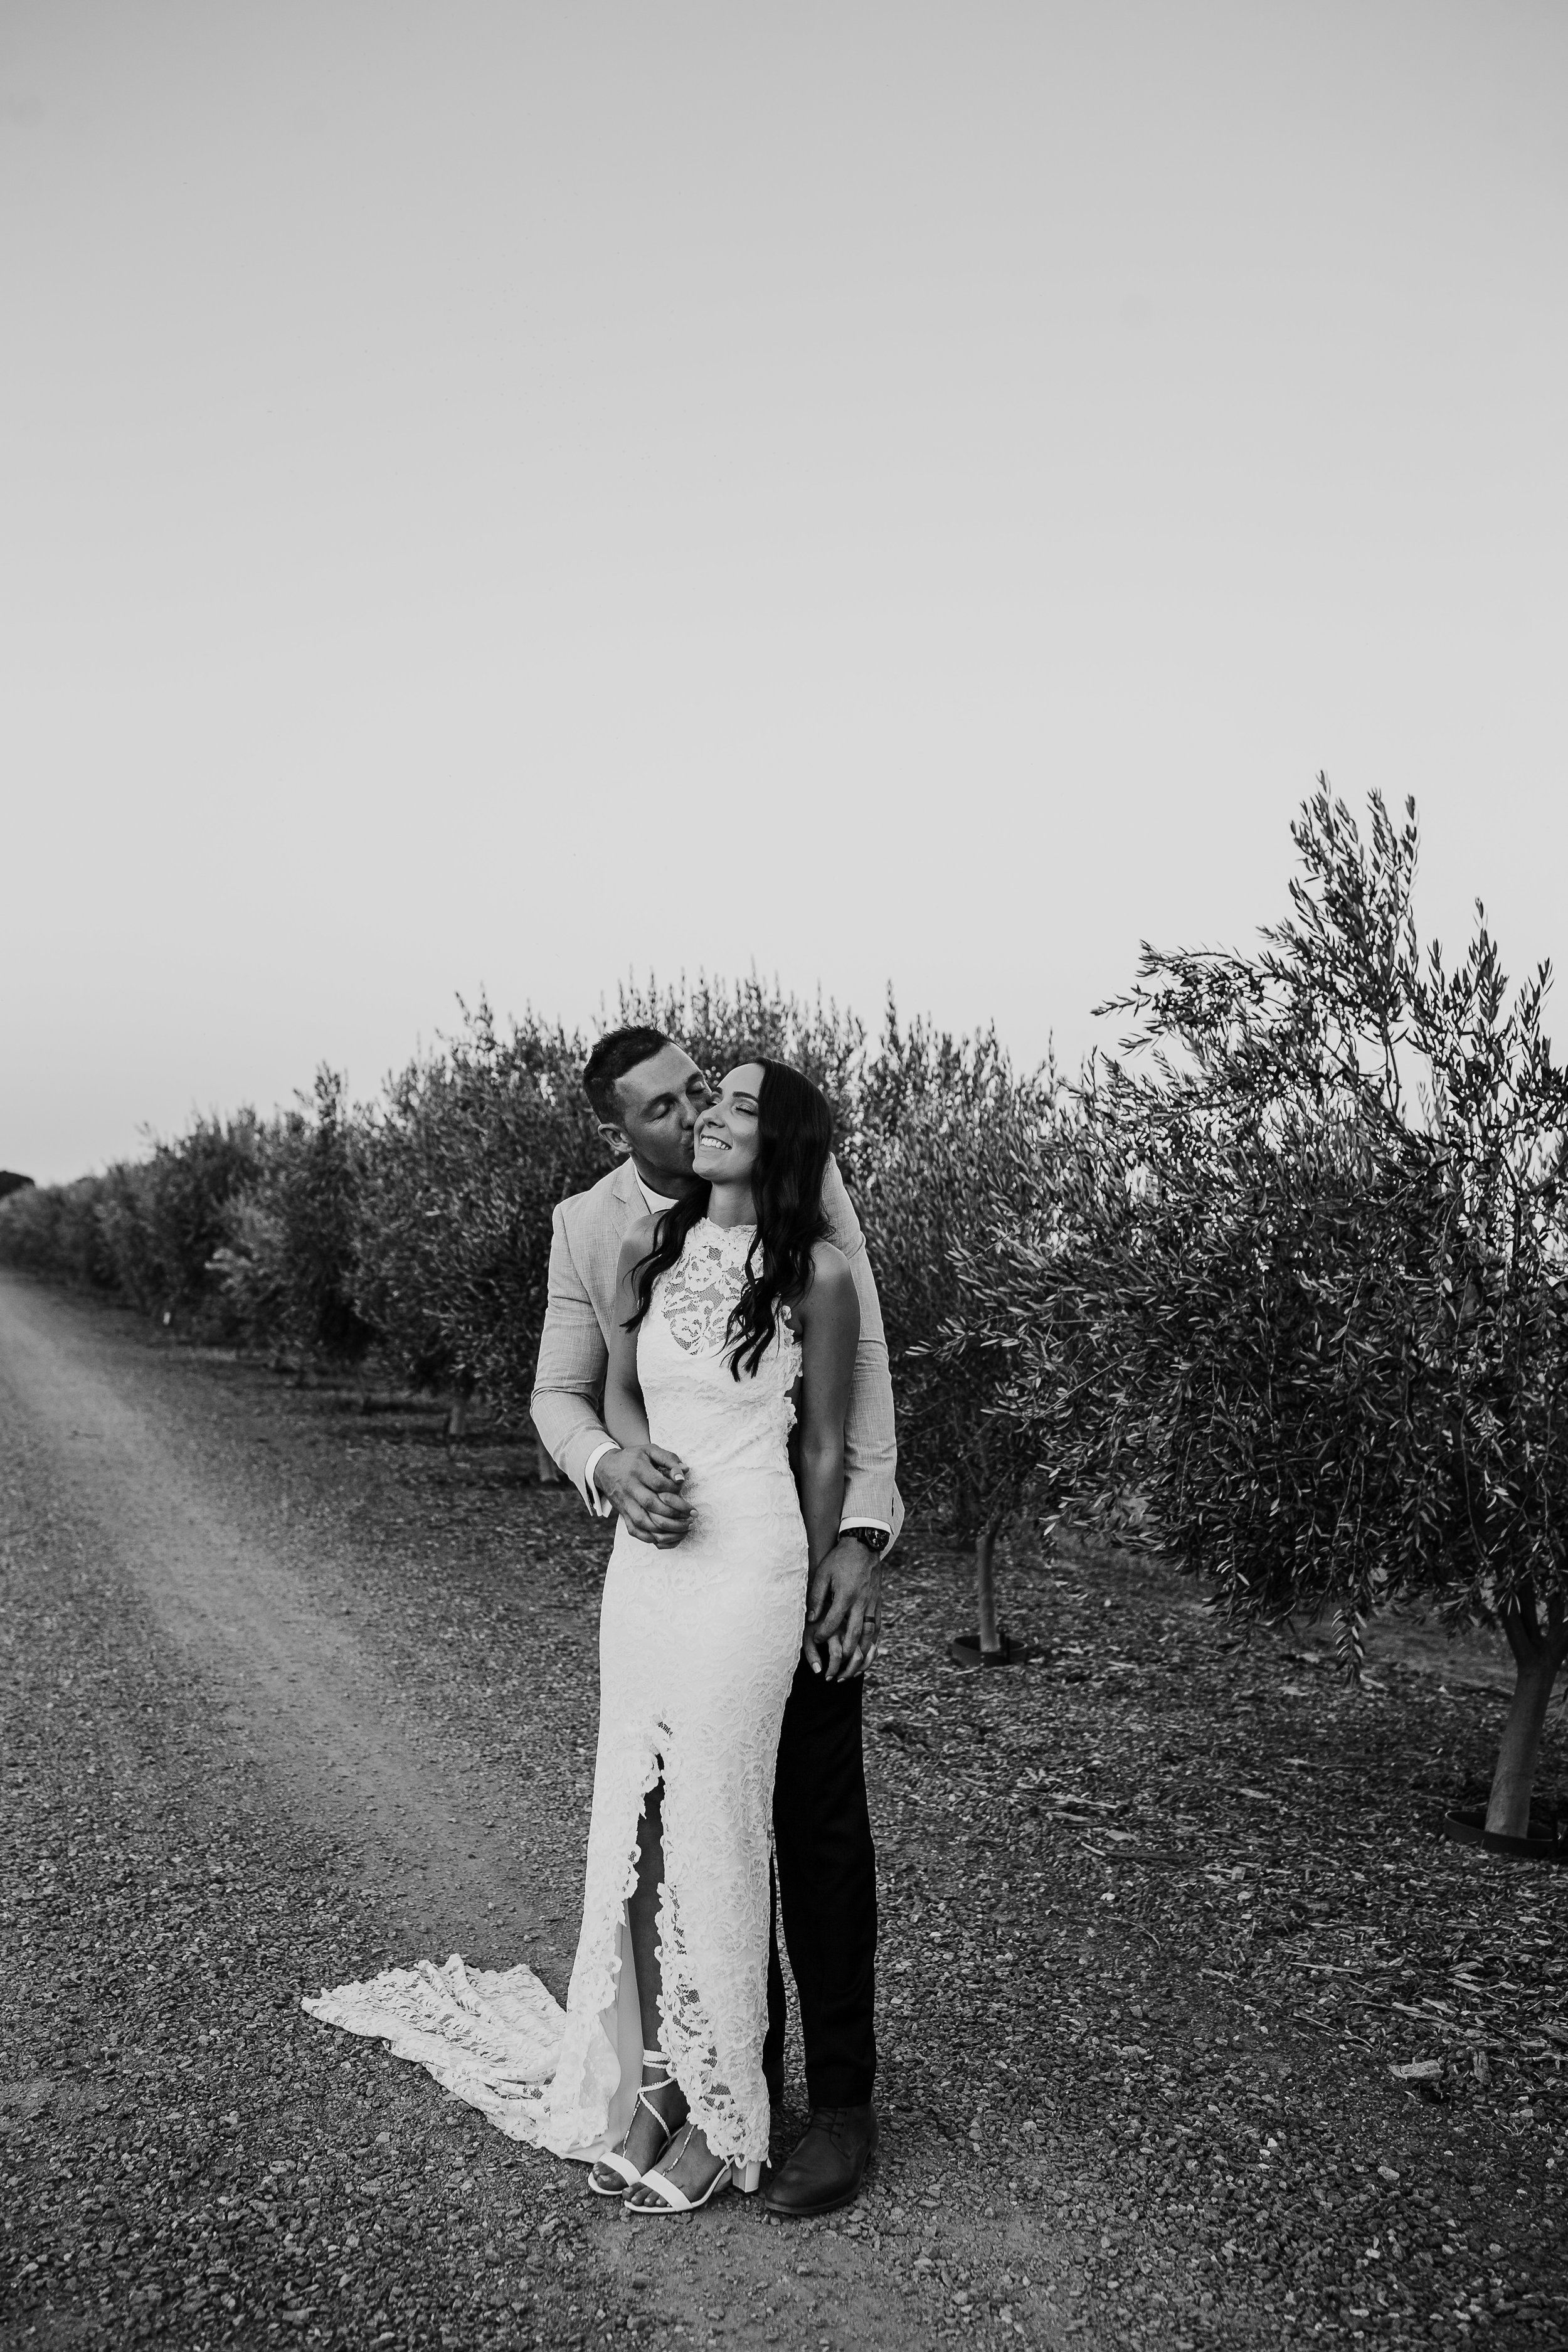 mickalathomas_puremacphotography_weddingphotographer_couplephotographer_Sheppartonphotographer_2932.jpg